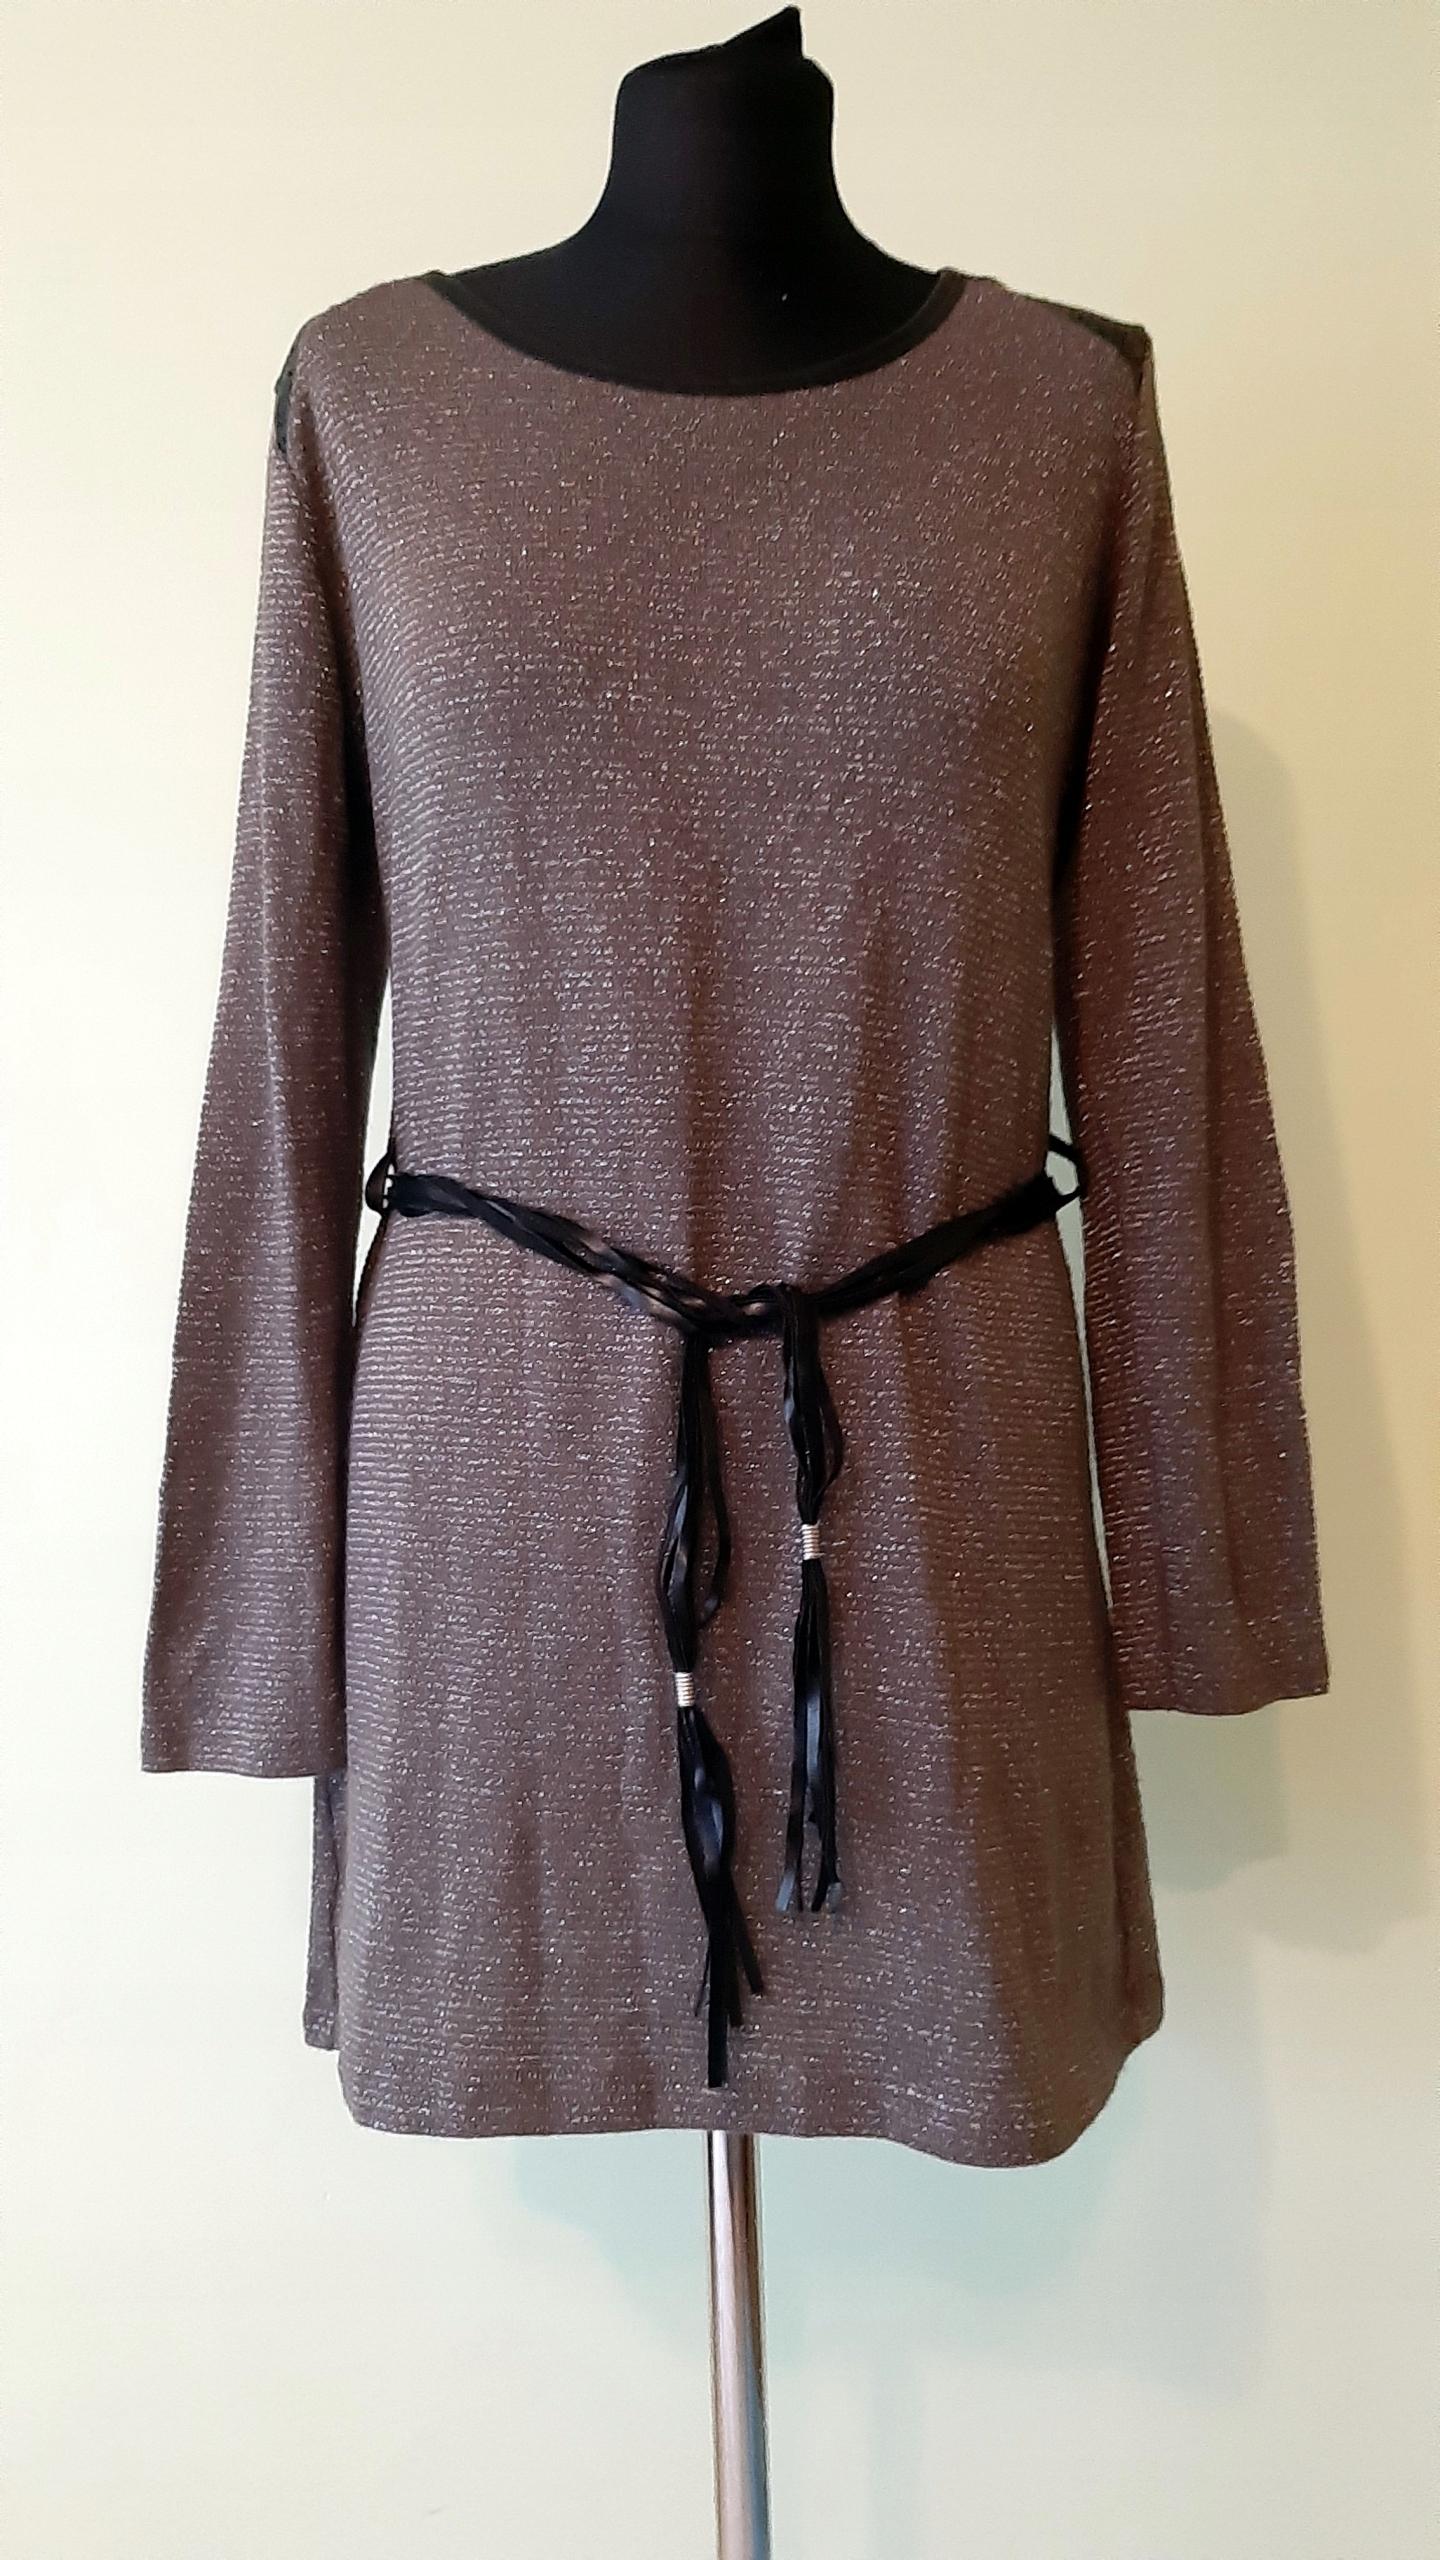 Piękna sukienka sweterkowa rozm M / L